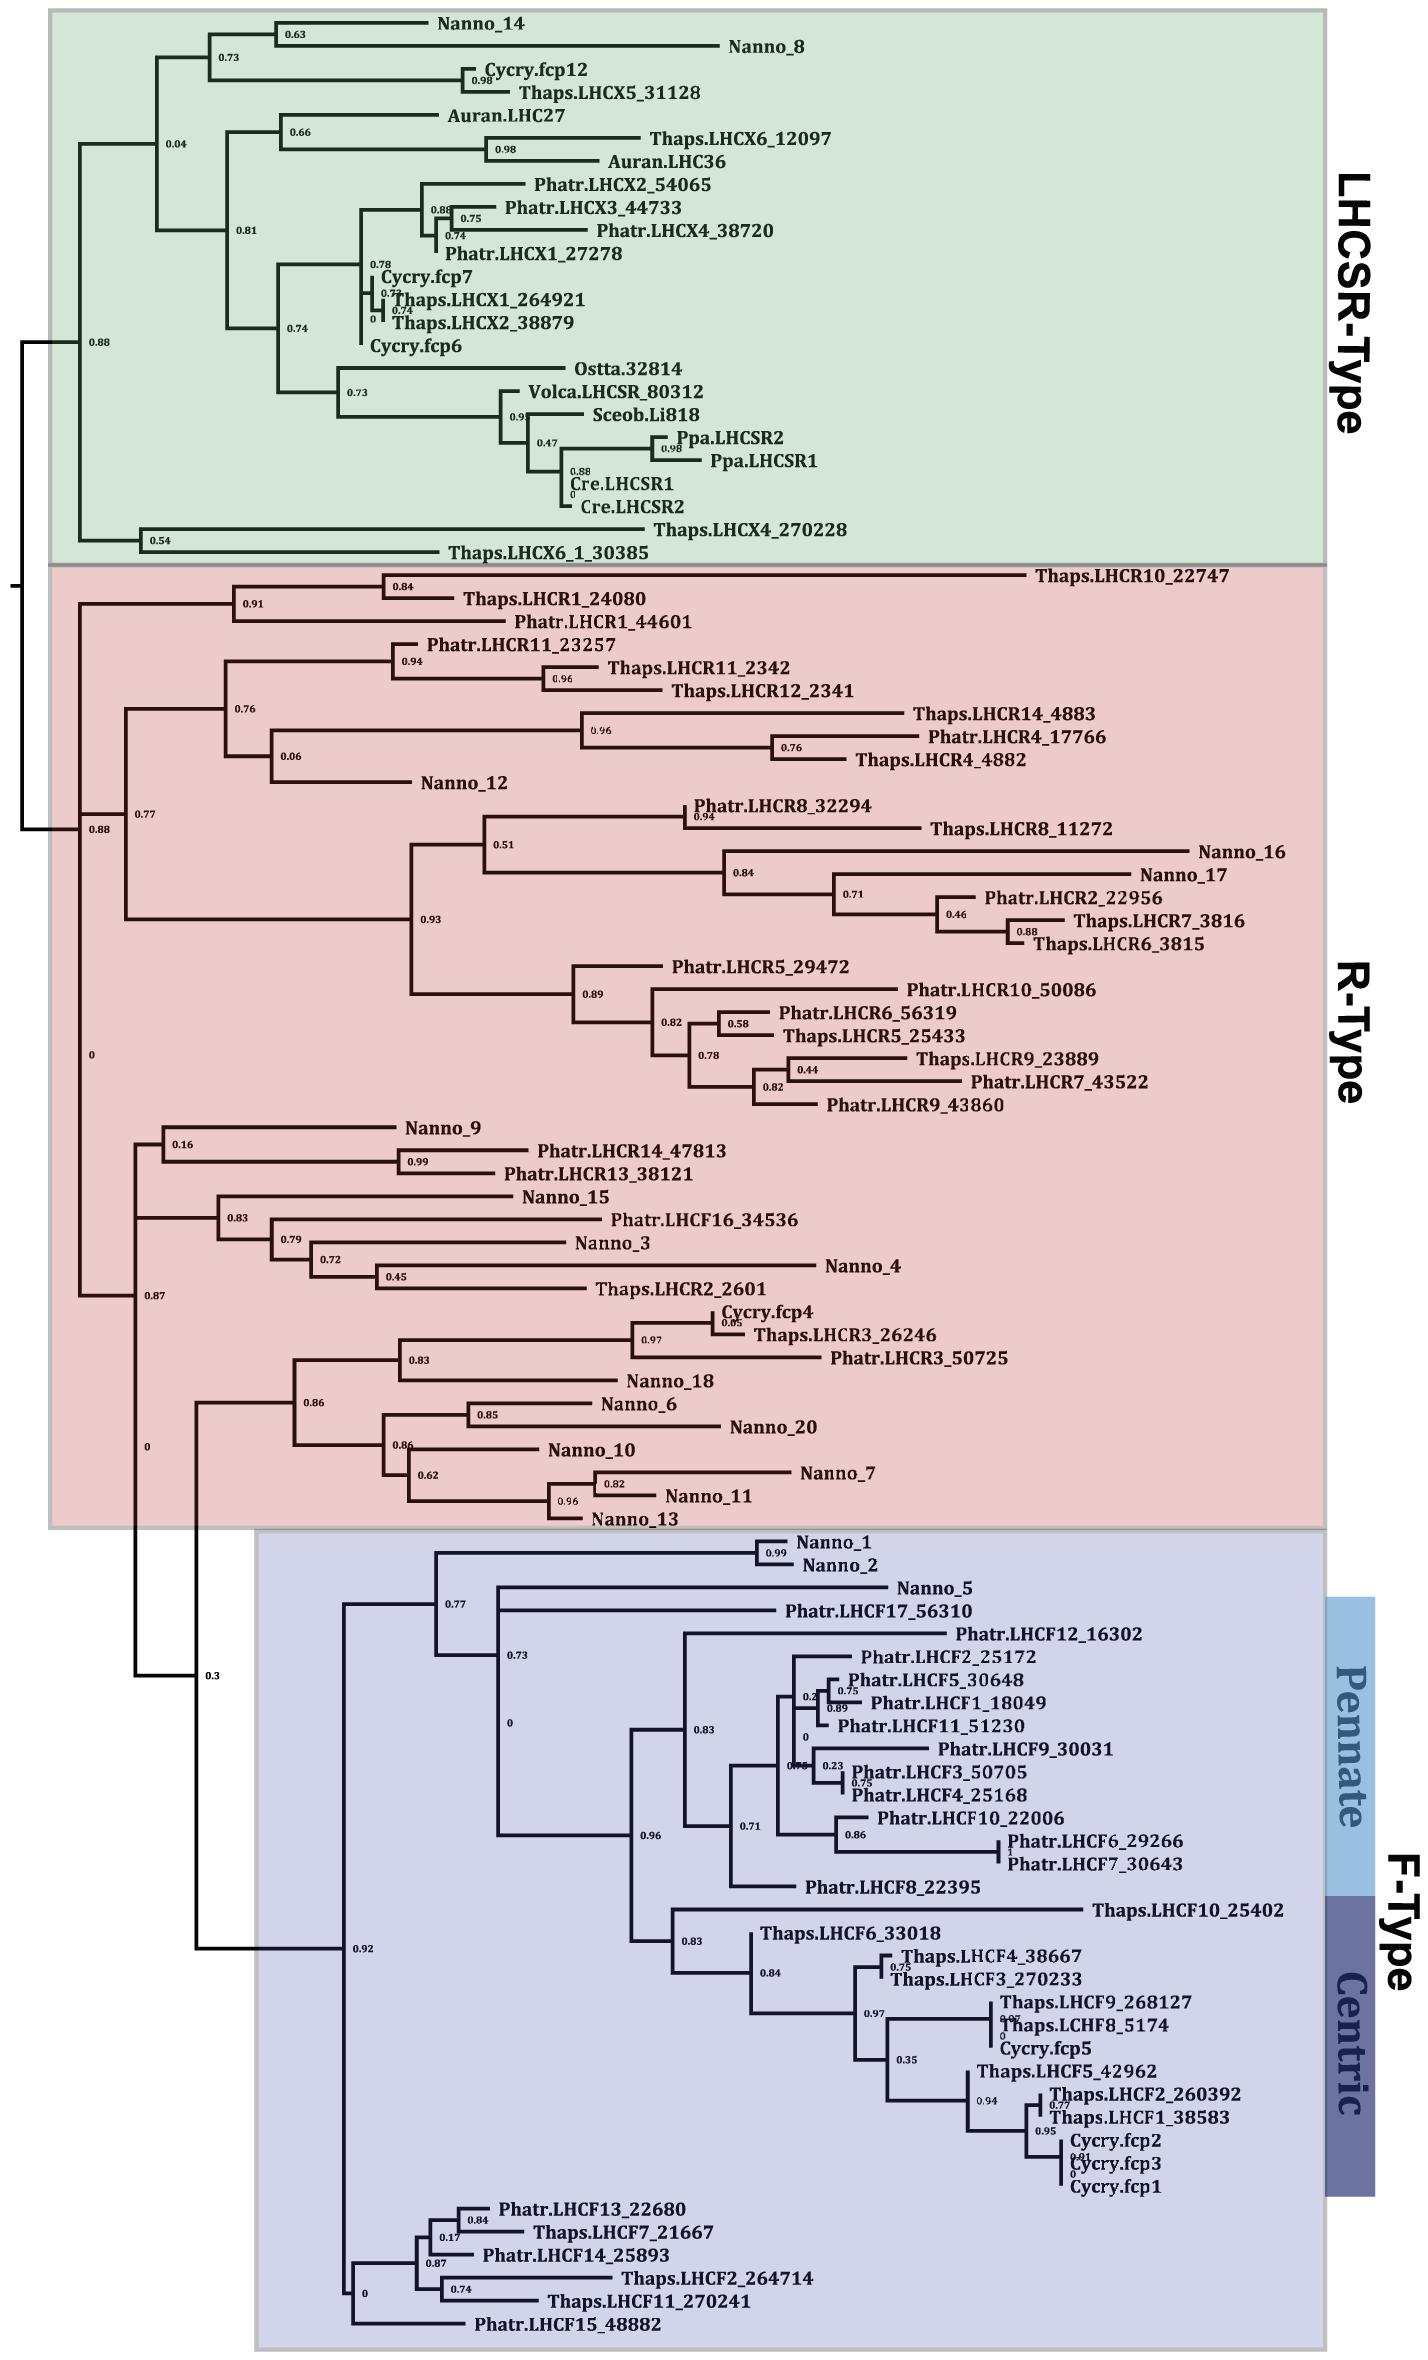 Maximum likelihood analysis of a MUSCLE alignment of 19 of the identified putative VCP protein sequences from <i>Nannochloropsis oceanica</i> CCMP1779 (Nanno) and the annotated LHC and LHCSR-like sequences from <i>Phaeodactylum tricornutum</i> (Phatr), <i>Cyclotella cryptica</i> (Cycry), <i>Thalassiosira pseudonana</i> (Thaps), <i>Aureococcus anophagefferens</i> (Auran), and the LHCSR-like sequences from <i>Chlamydomonas reinhardtii</i> (Cre), <i>Ostreococcus tauri</i> (Ossta), <i>Physcomitrella patens</i> (Ppa), <i>Scenedesmus obliquus</i> (Sceob), and <i>Volvox carteri</i> (Volca).